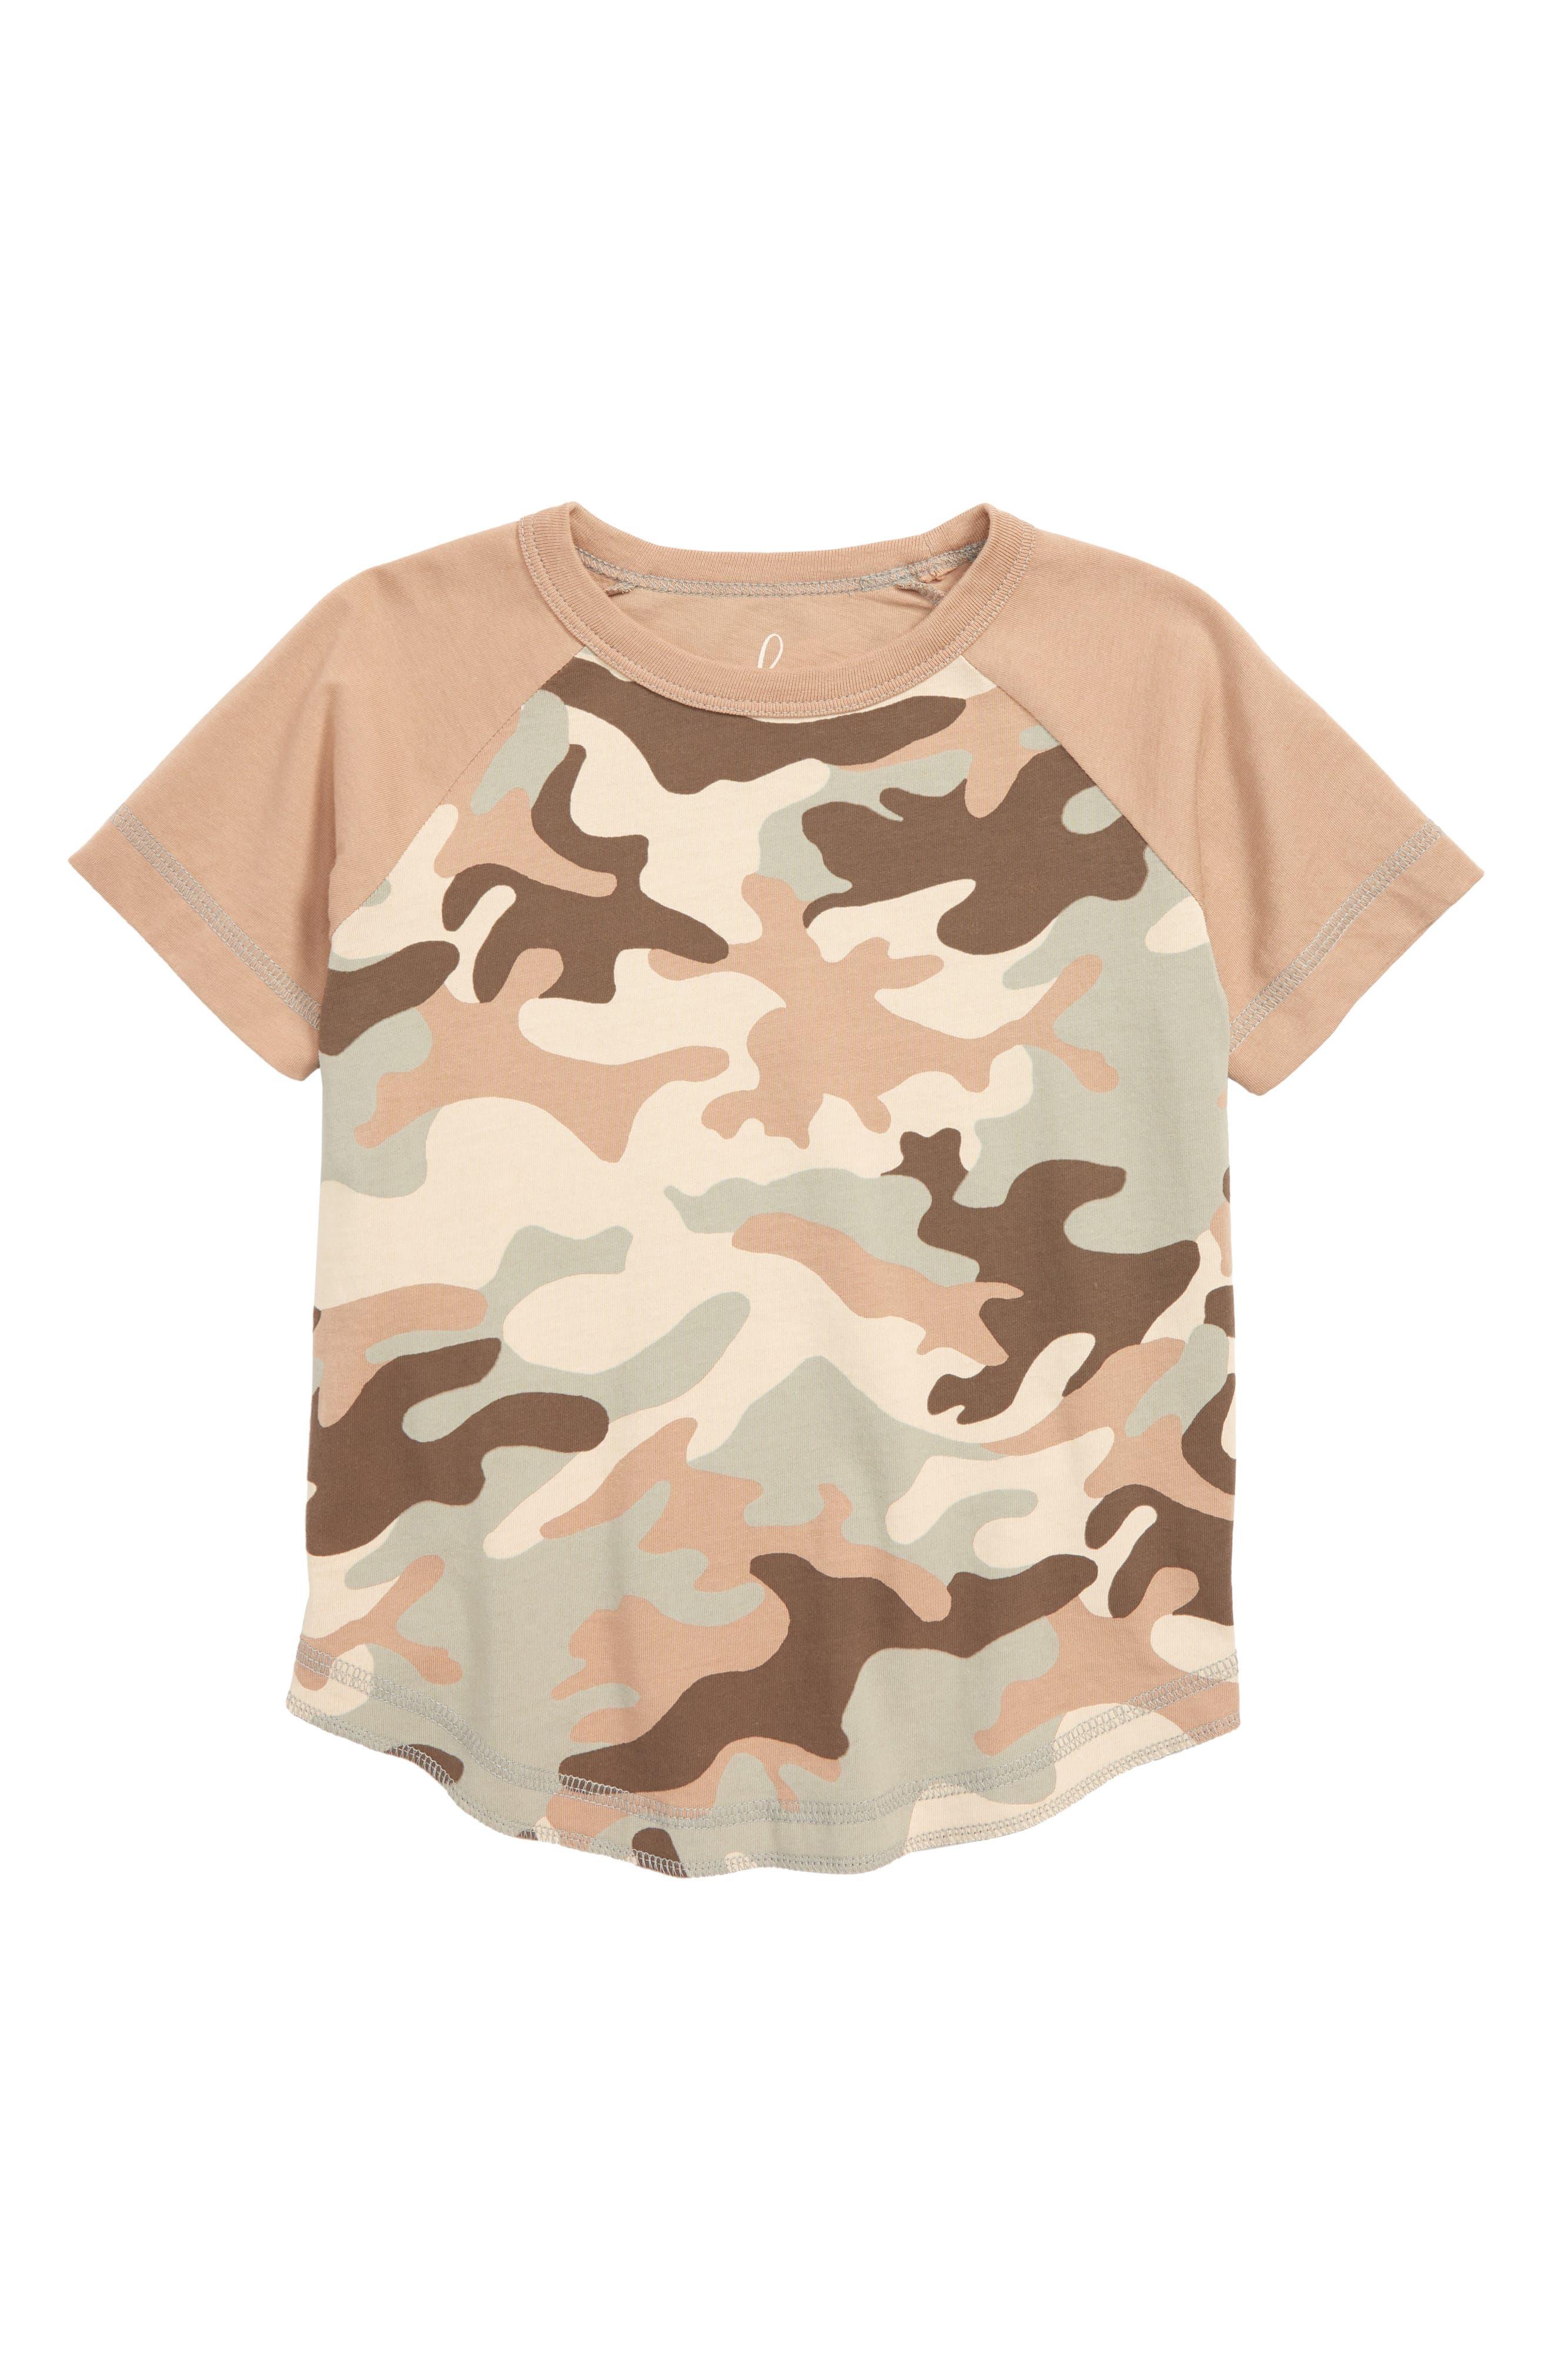 PEEK AREN'T YOU CURIOUS,                             Peek Camo T-Shirt,                             Main thumbnail 1, color,                             250